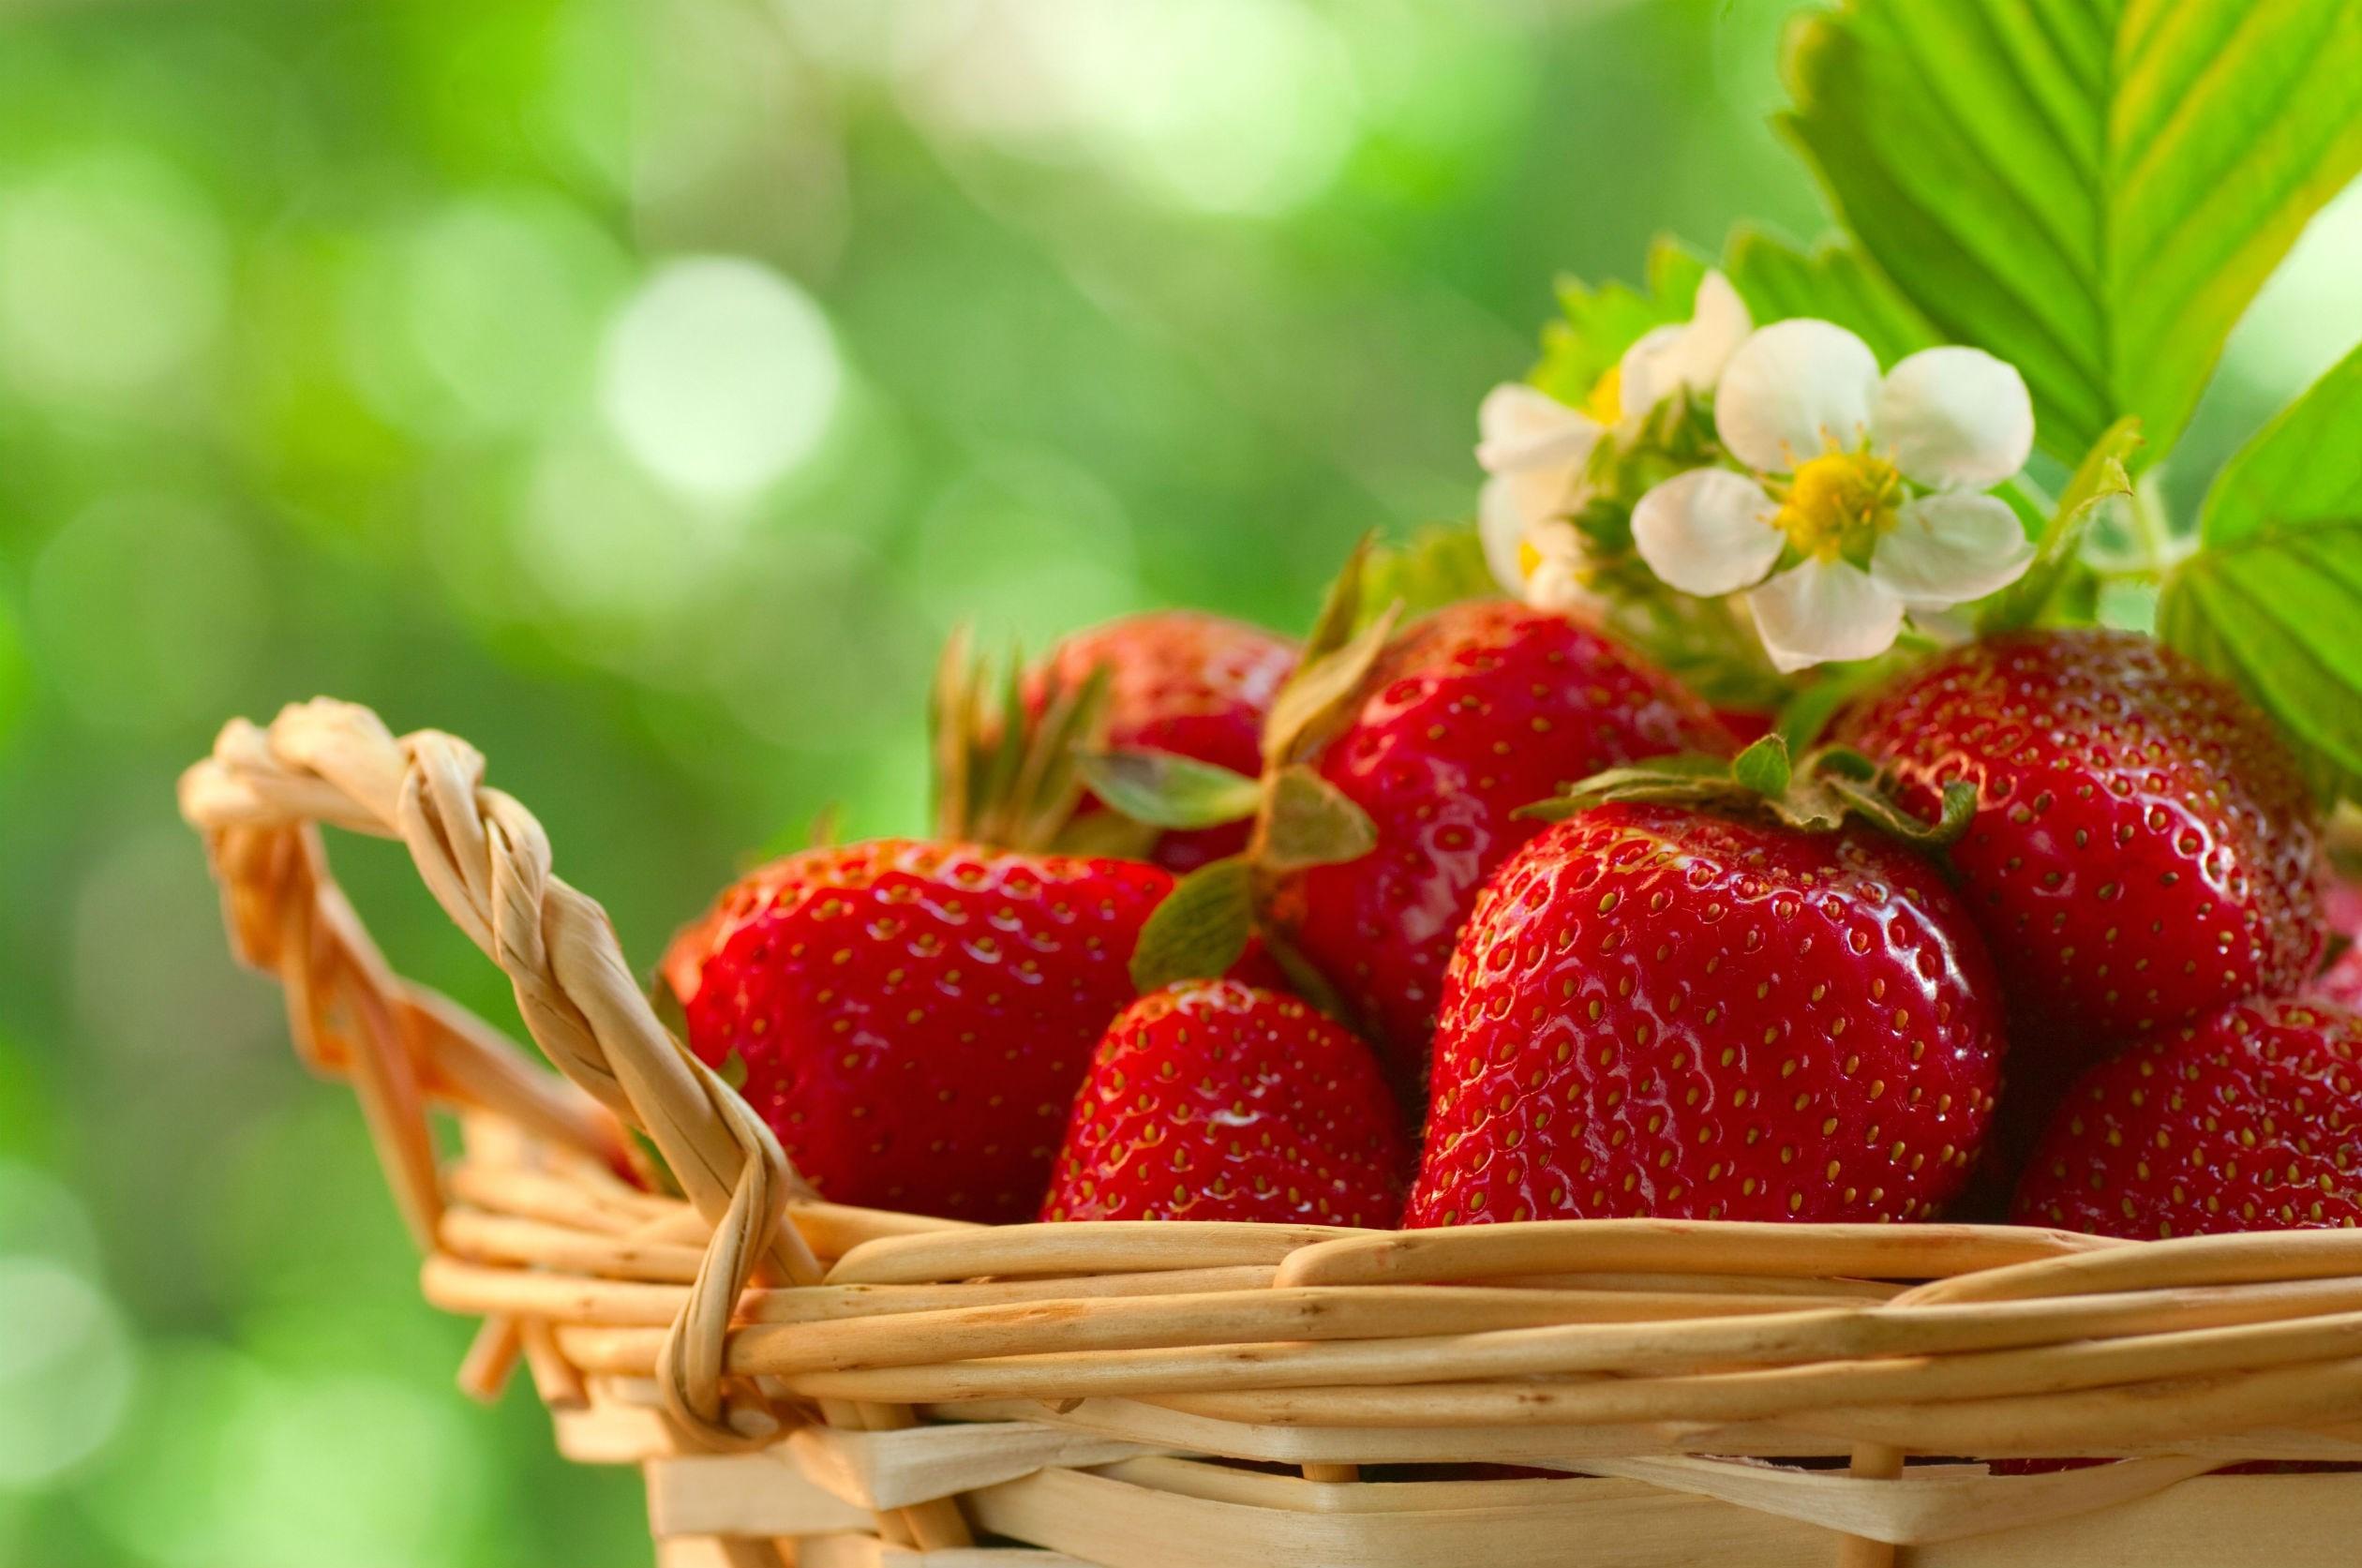 Fruit Strawberry Food Strawberries Wallpaper 2520x1673